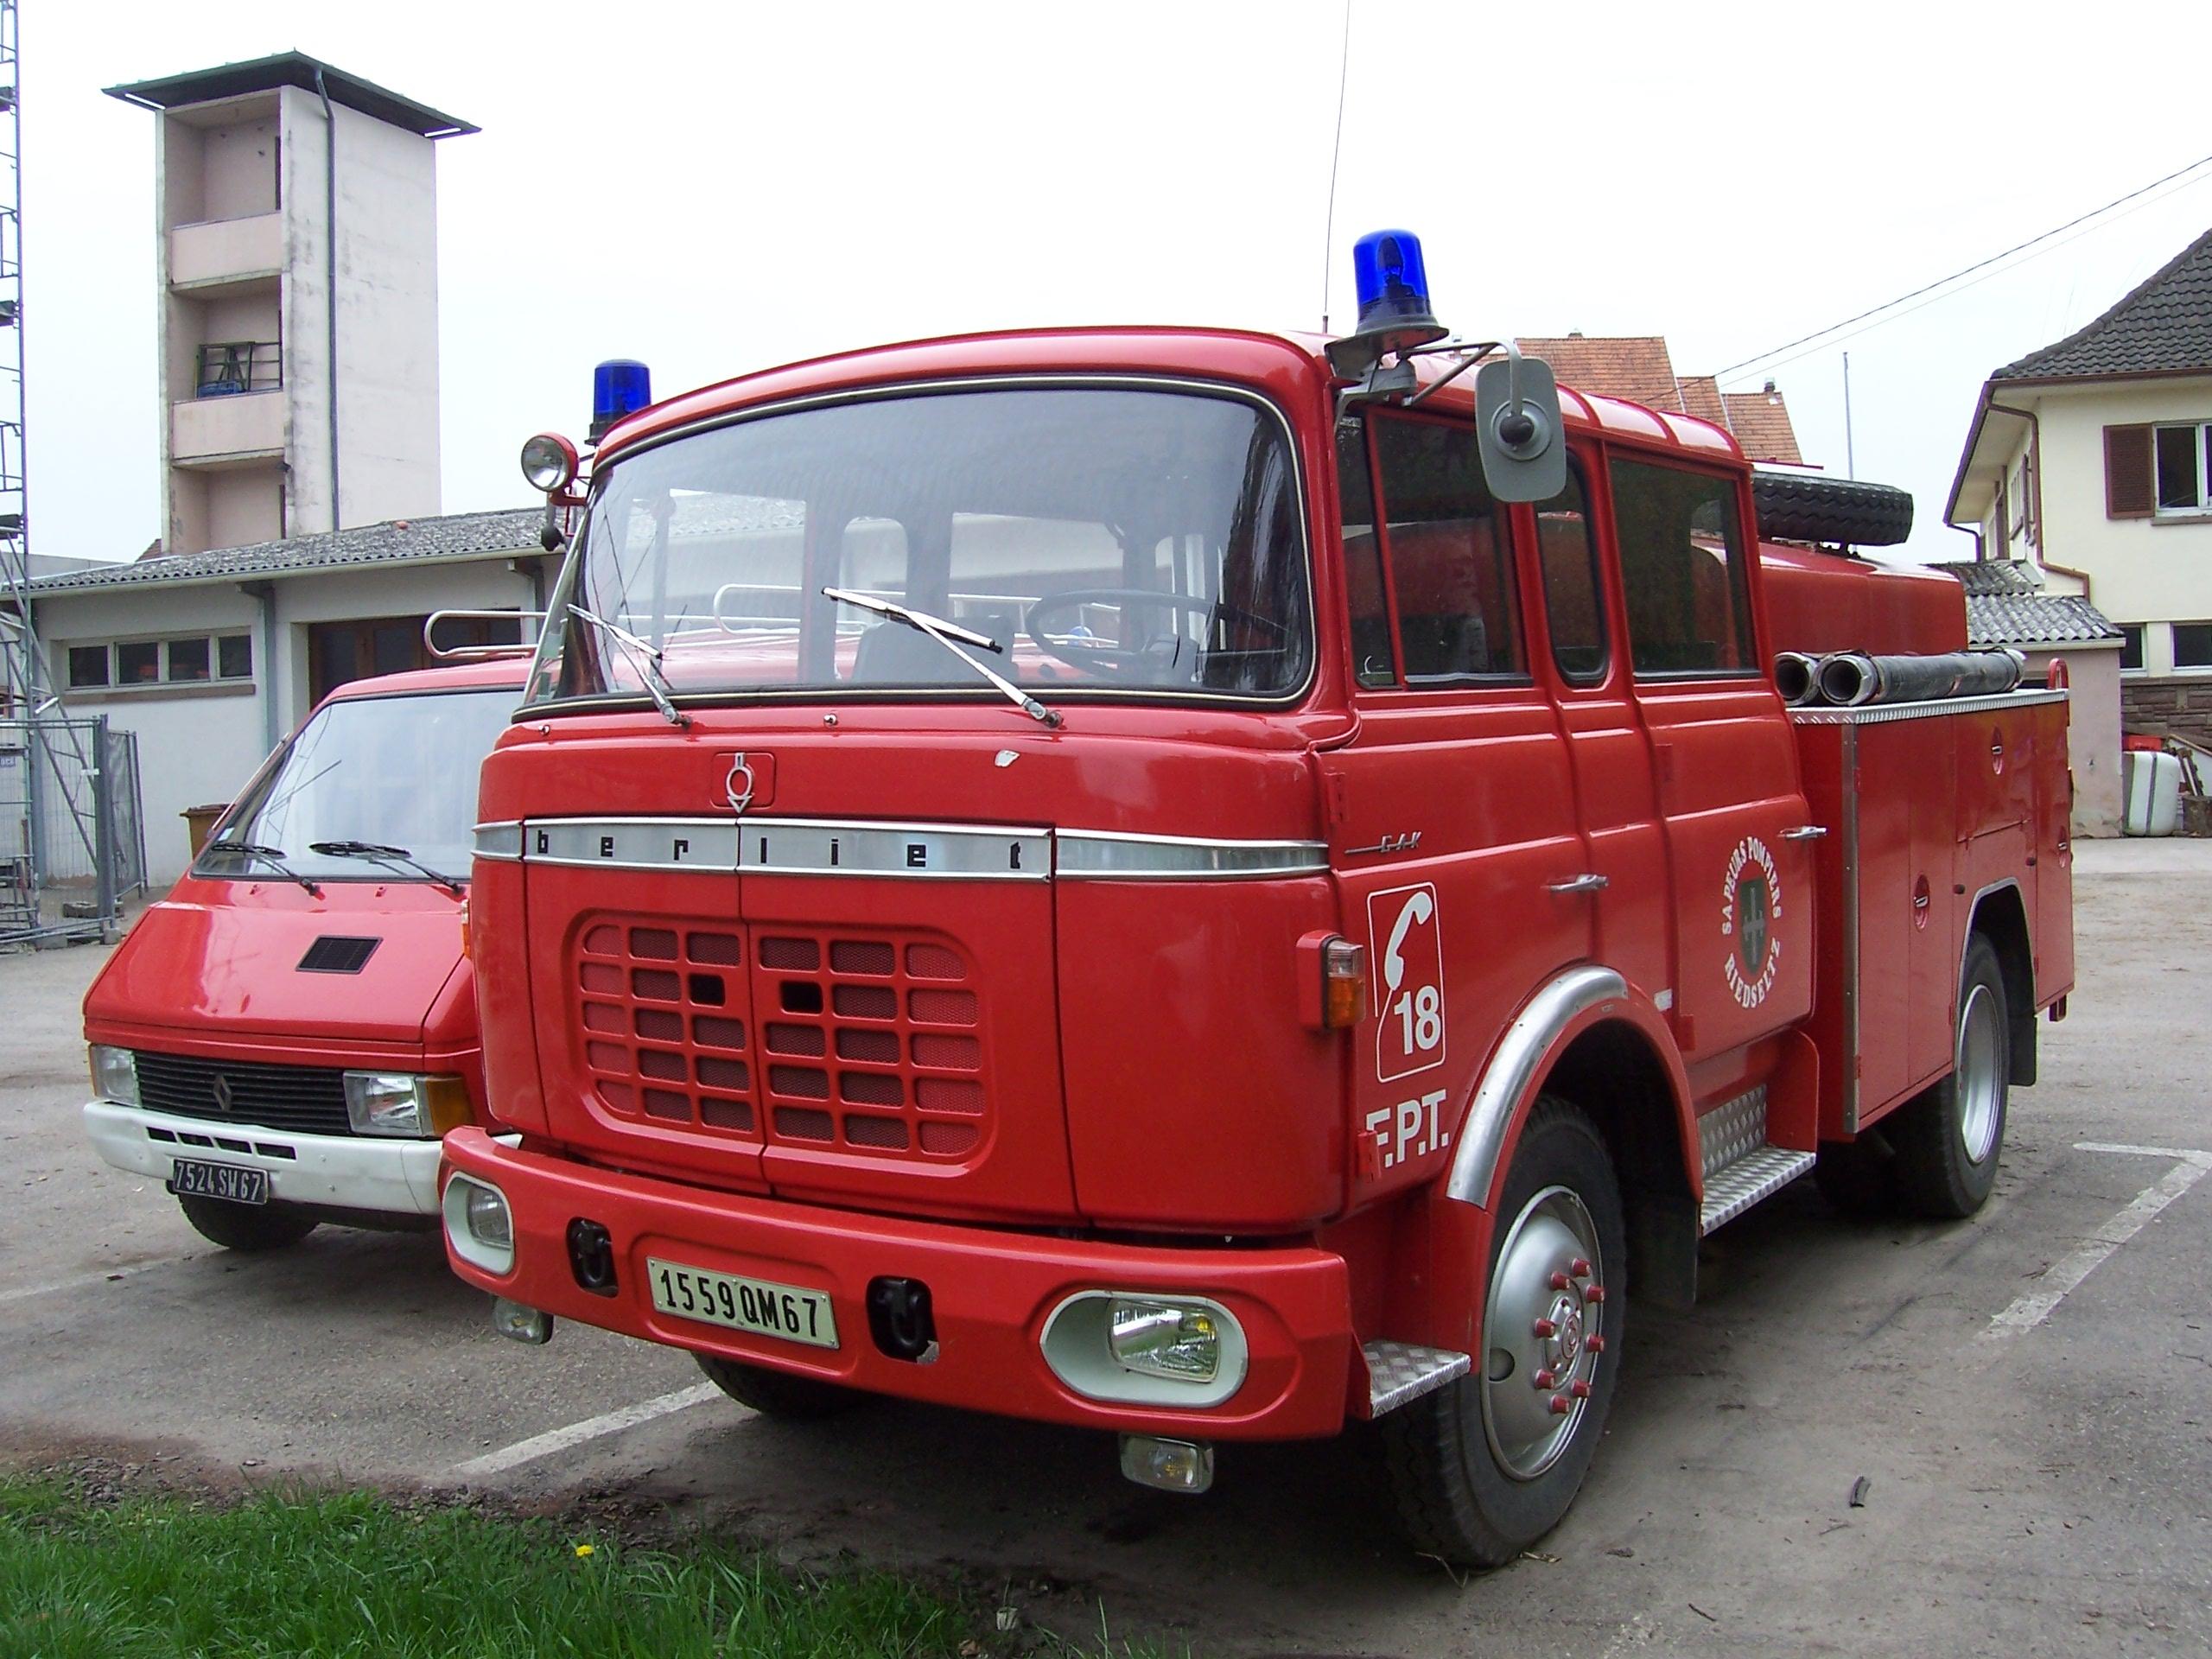 File:Berliet-GAK Wisse...